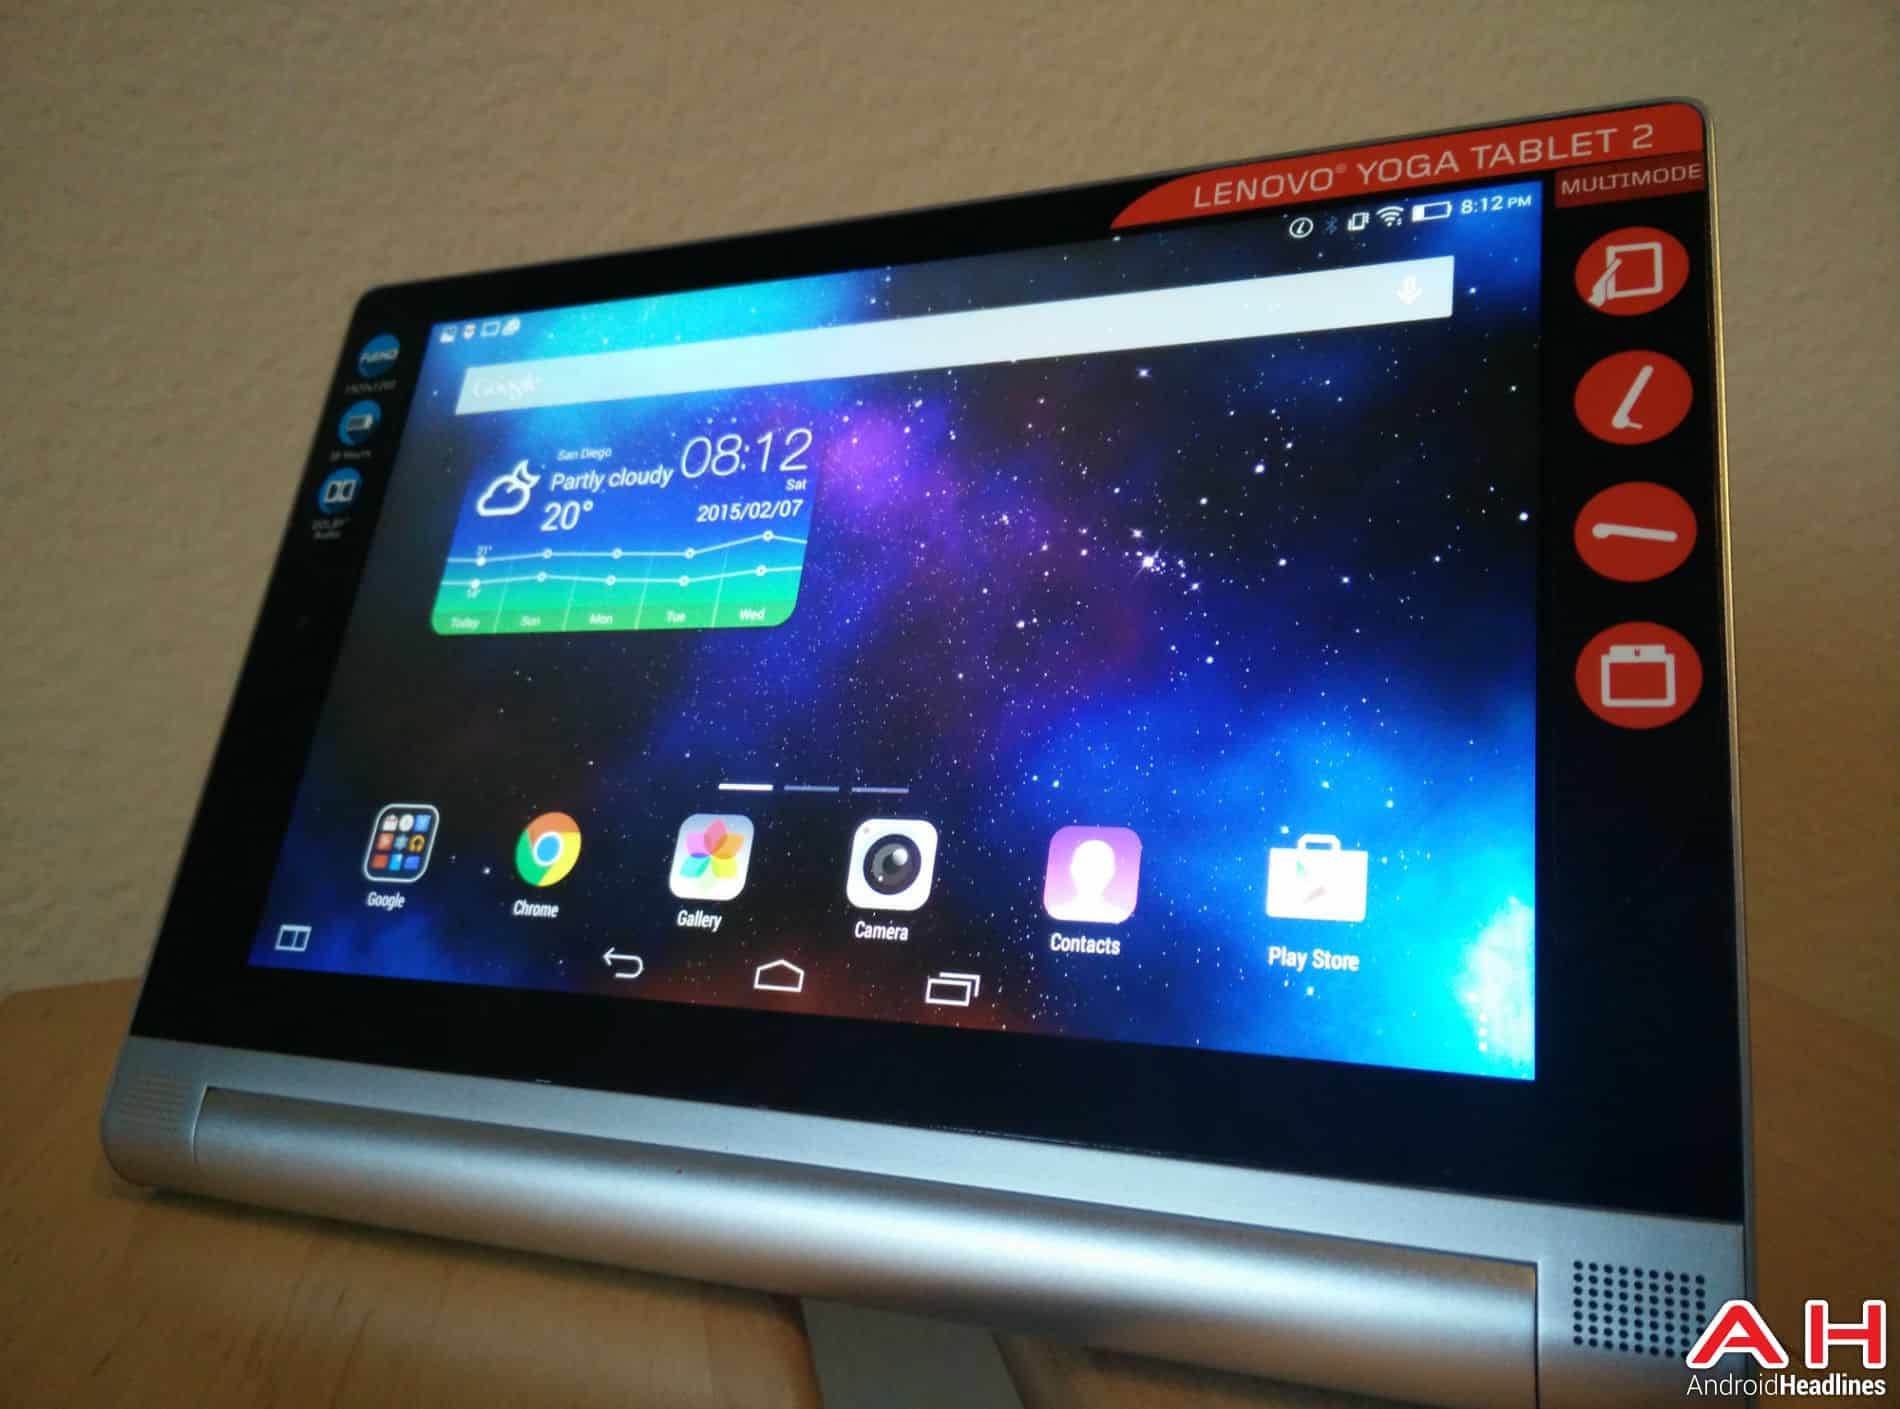 Lenovo Yoga Tablet 2 8 inch AH3